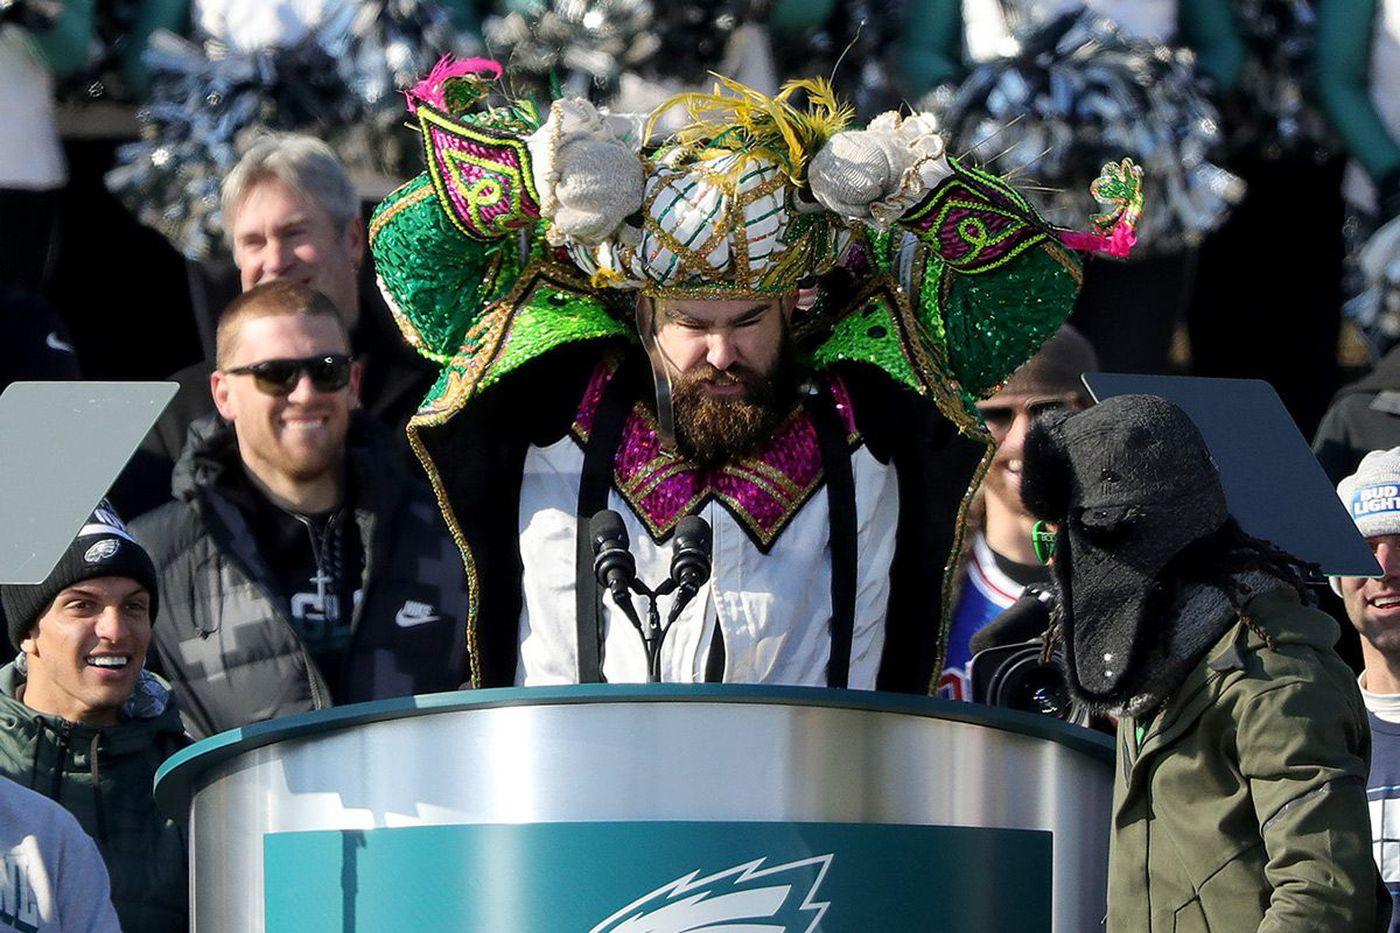 In epic speech, Eagles' Jason Kelce calls out 'clown' who criticized Doug Pederson